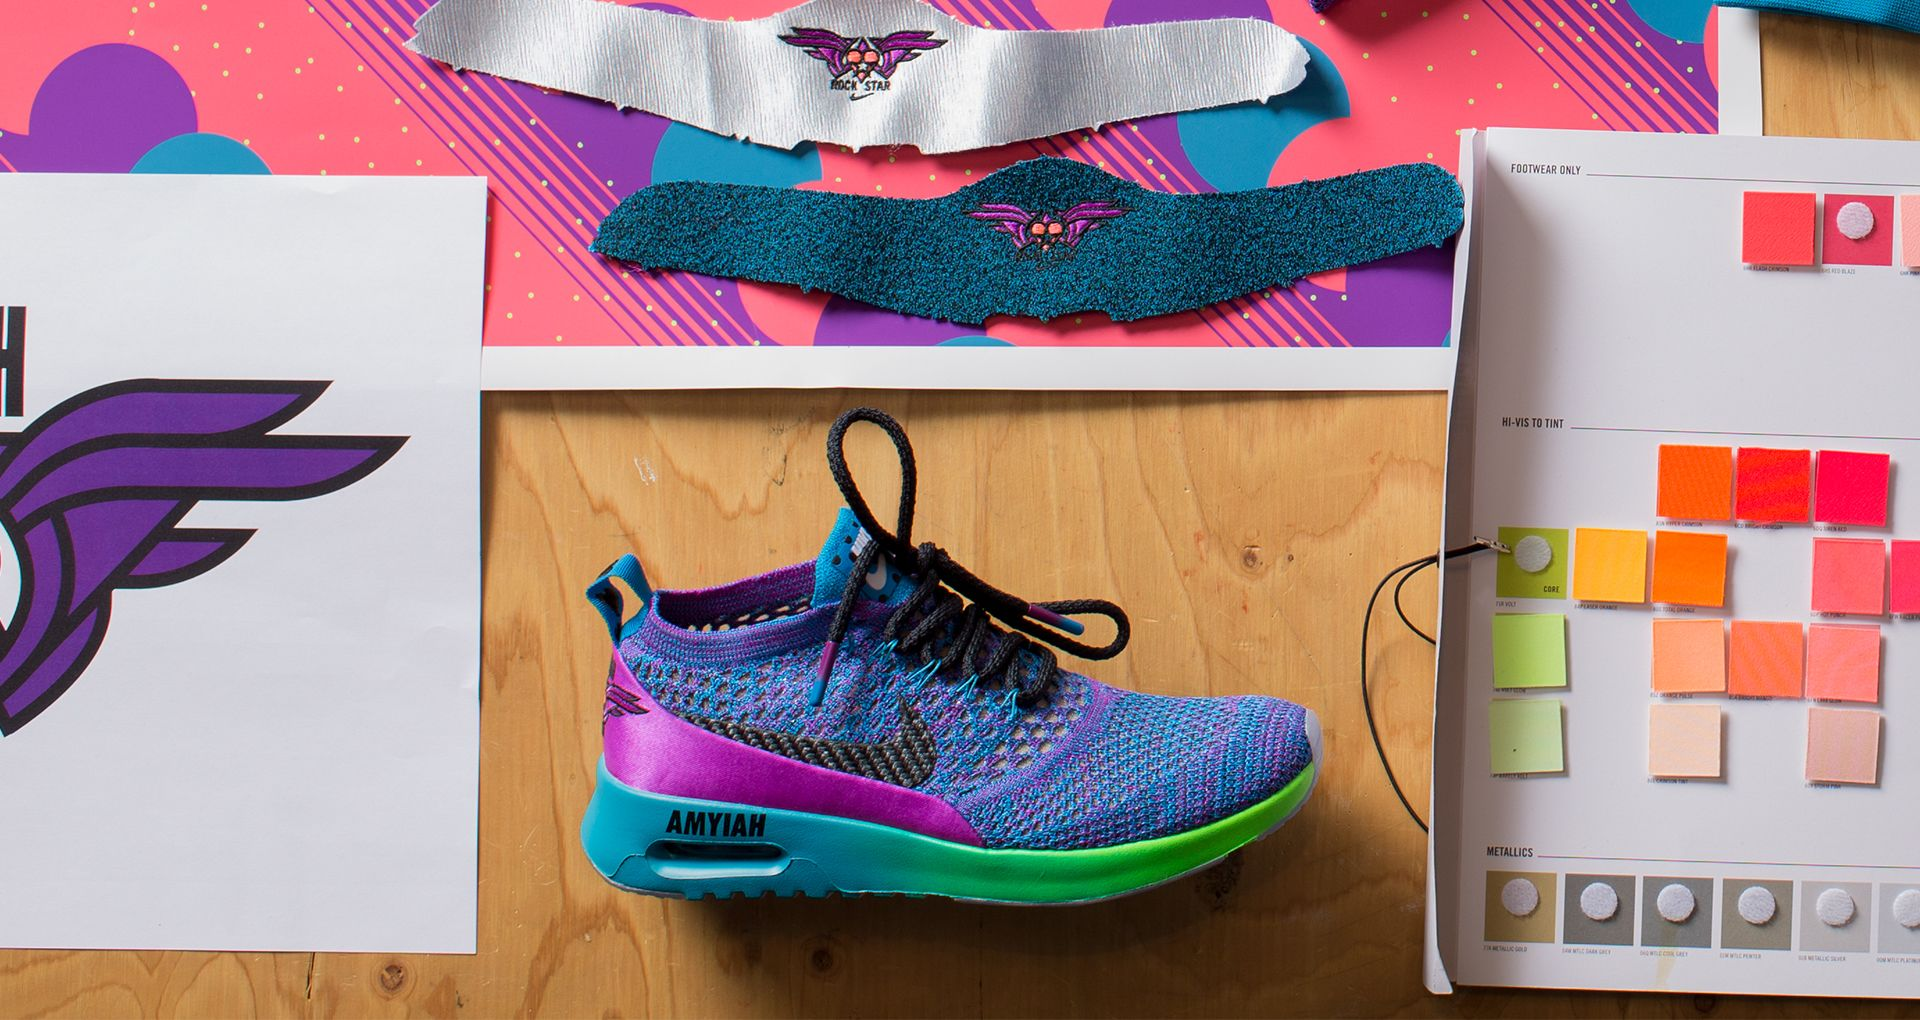 ce0ddab9e411f Behind The Design  Amyiah s Air Max Thea Ultra Flyknit 2017. Nike+ ...